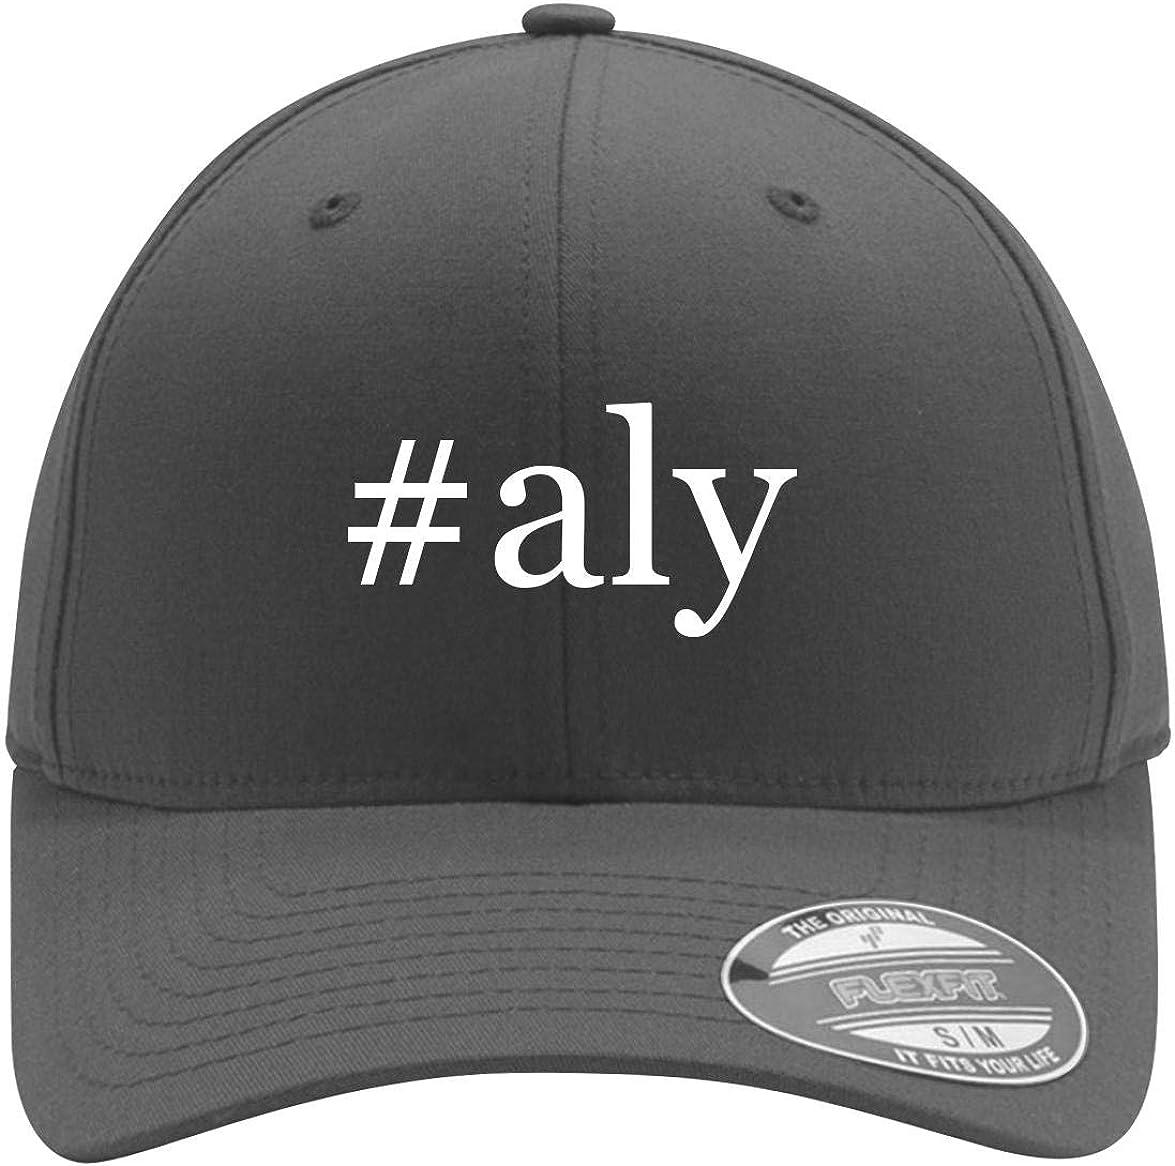 #aly - Adult Men's Hashtag Flexfit Baseball Hat Cap 61yVFnaZsqL